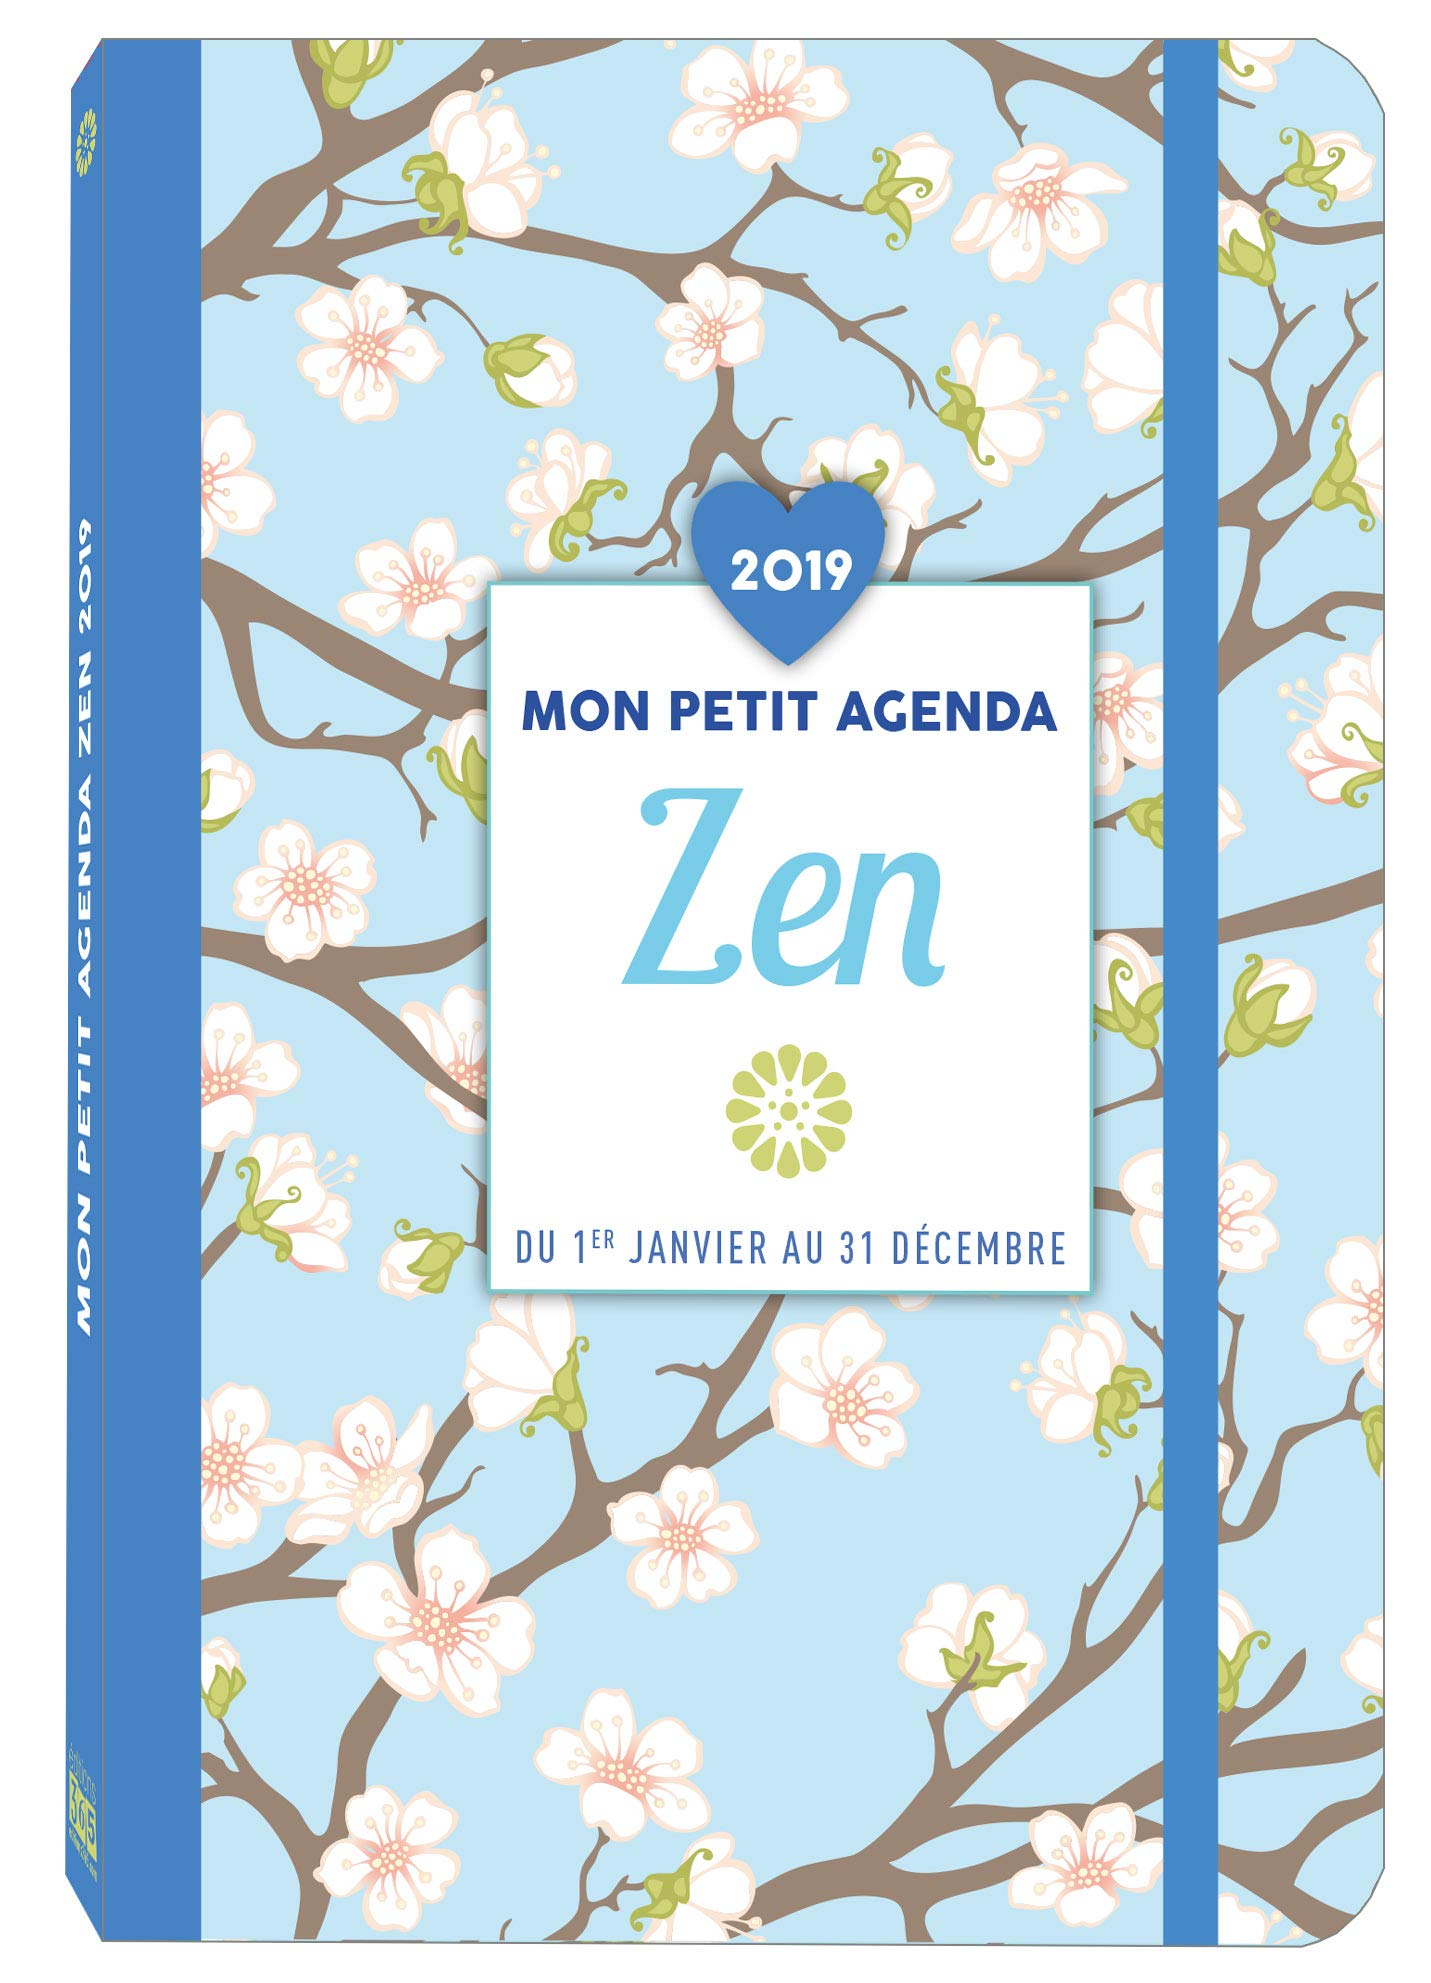 Mon petit agenda Zen 2019: 9782377611249: Amazon.com: Books